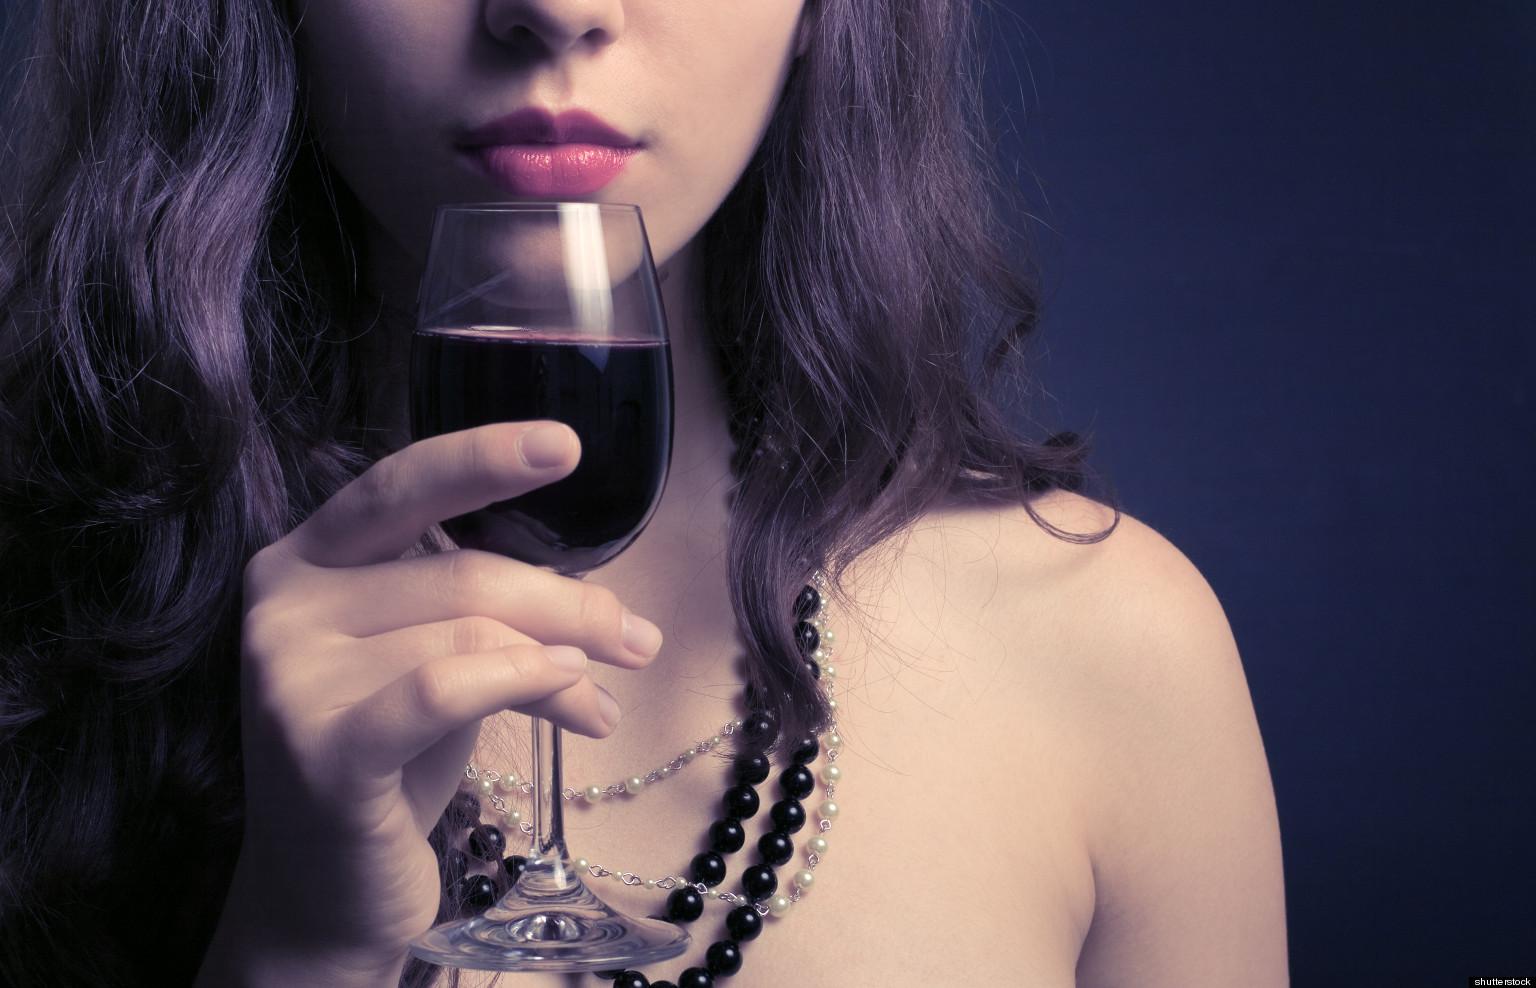 o-WOMAN-DRINKING-facebook1